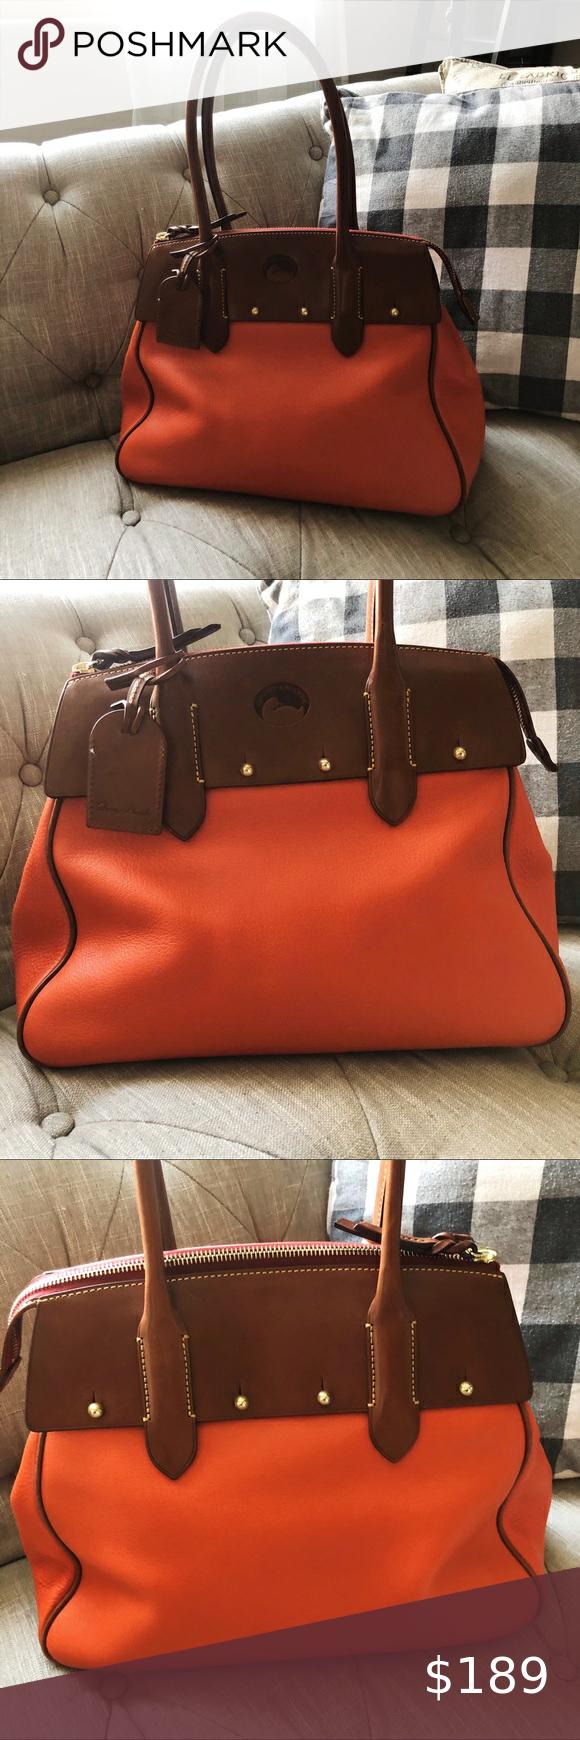 Dooney & Bourke Large Rare Wilson Leather Satchel in 2020